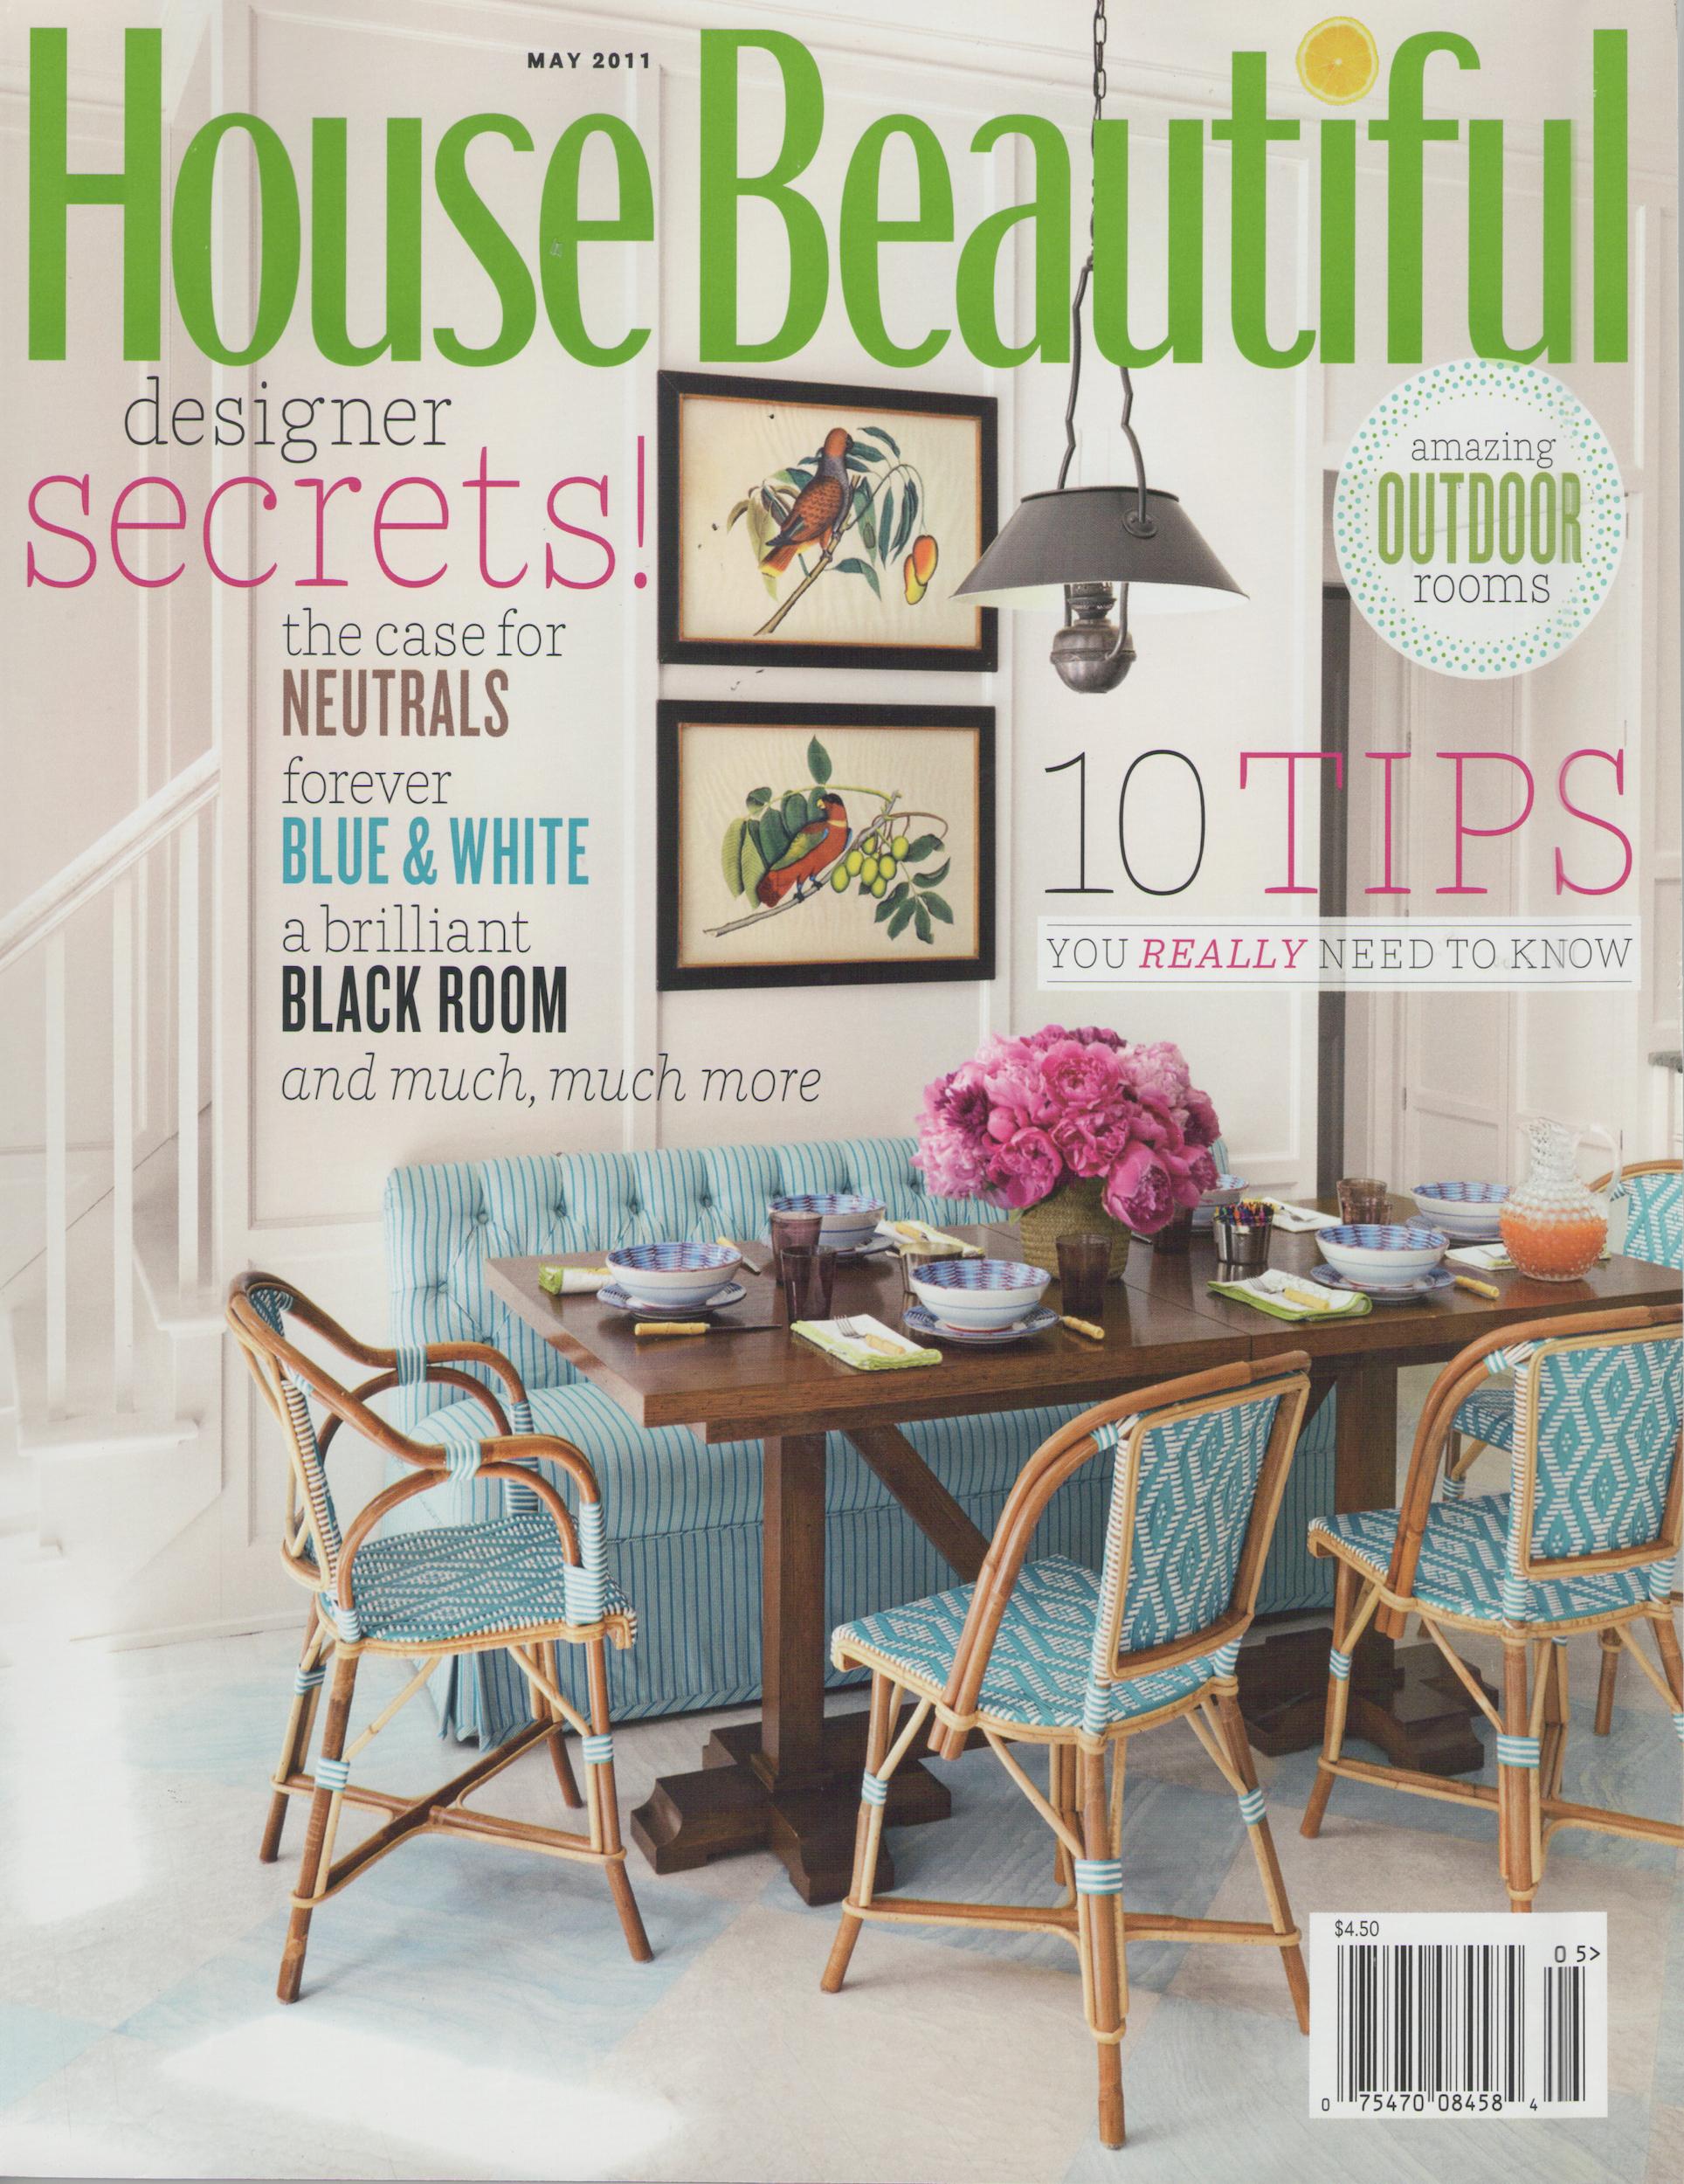 House Beautiful Cover2011 copy 2.jpg